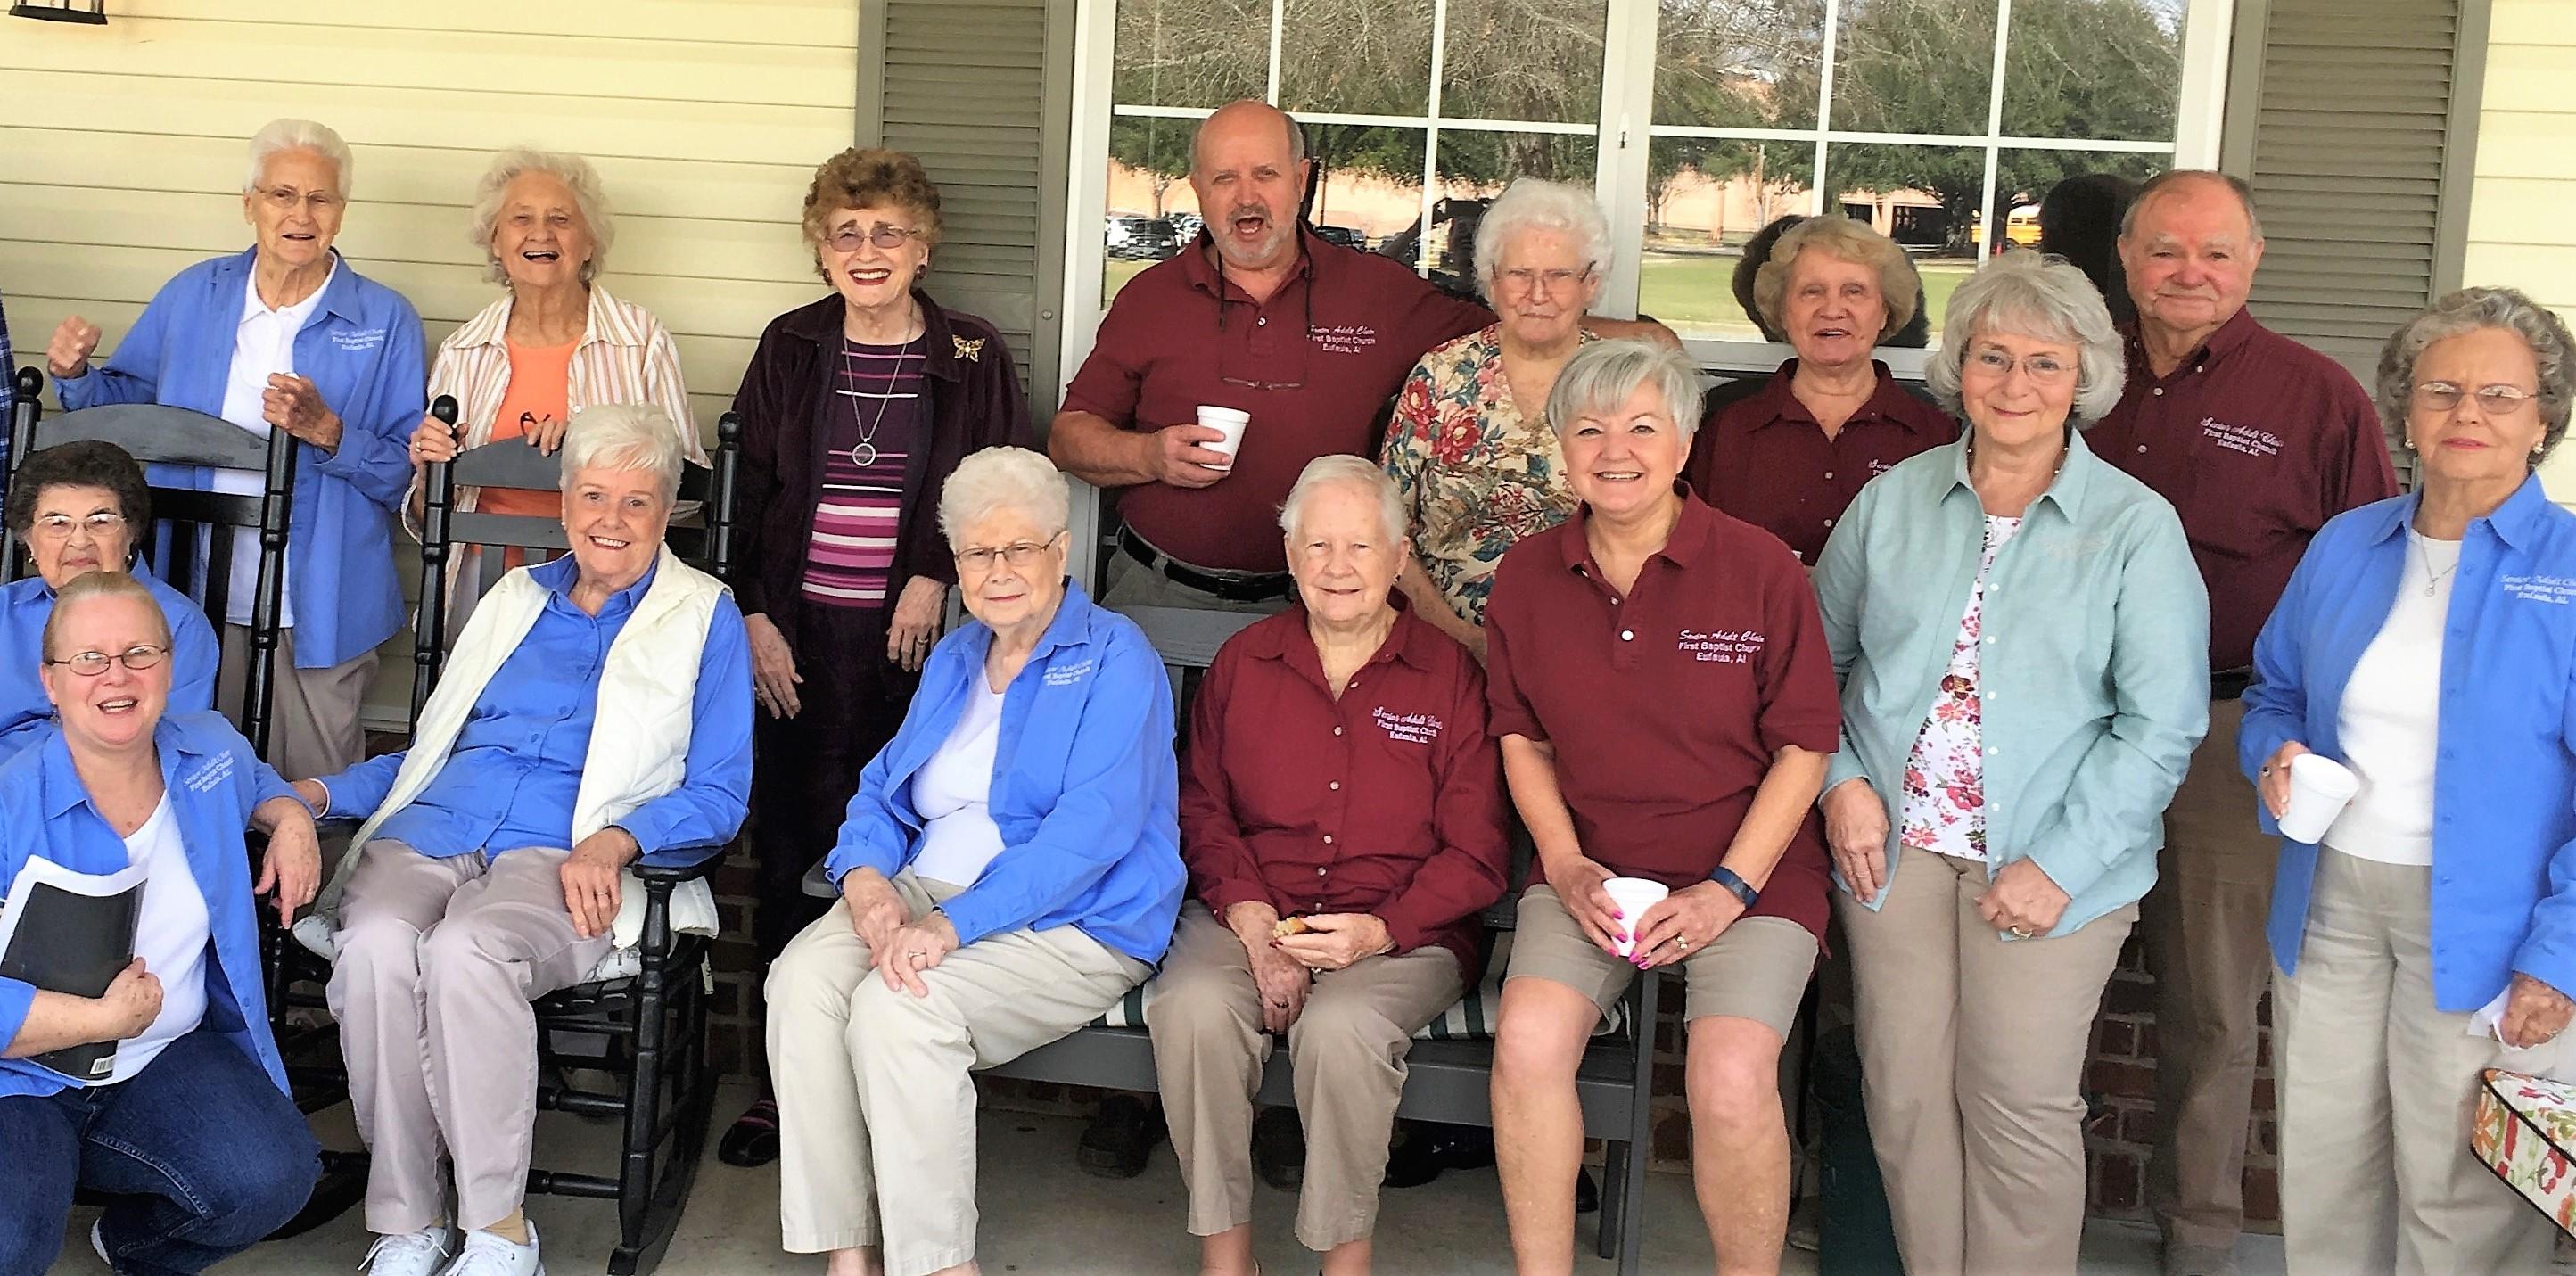 wide-shot-senior-adults-porch